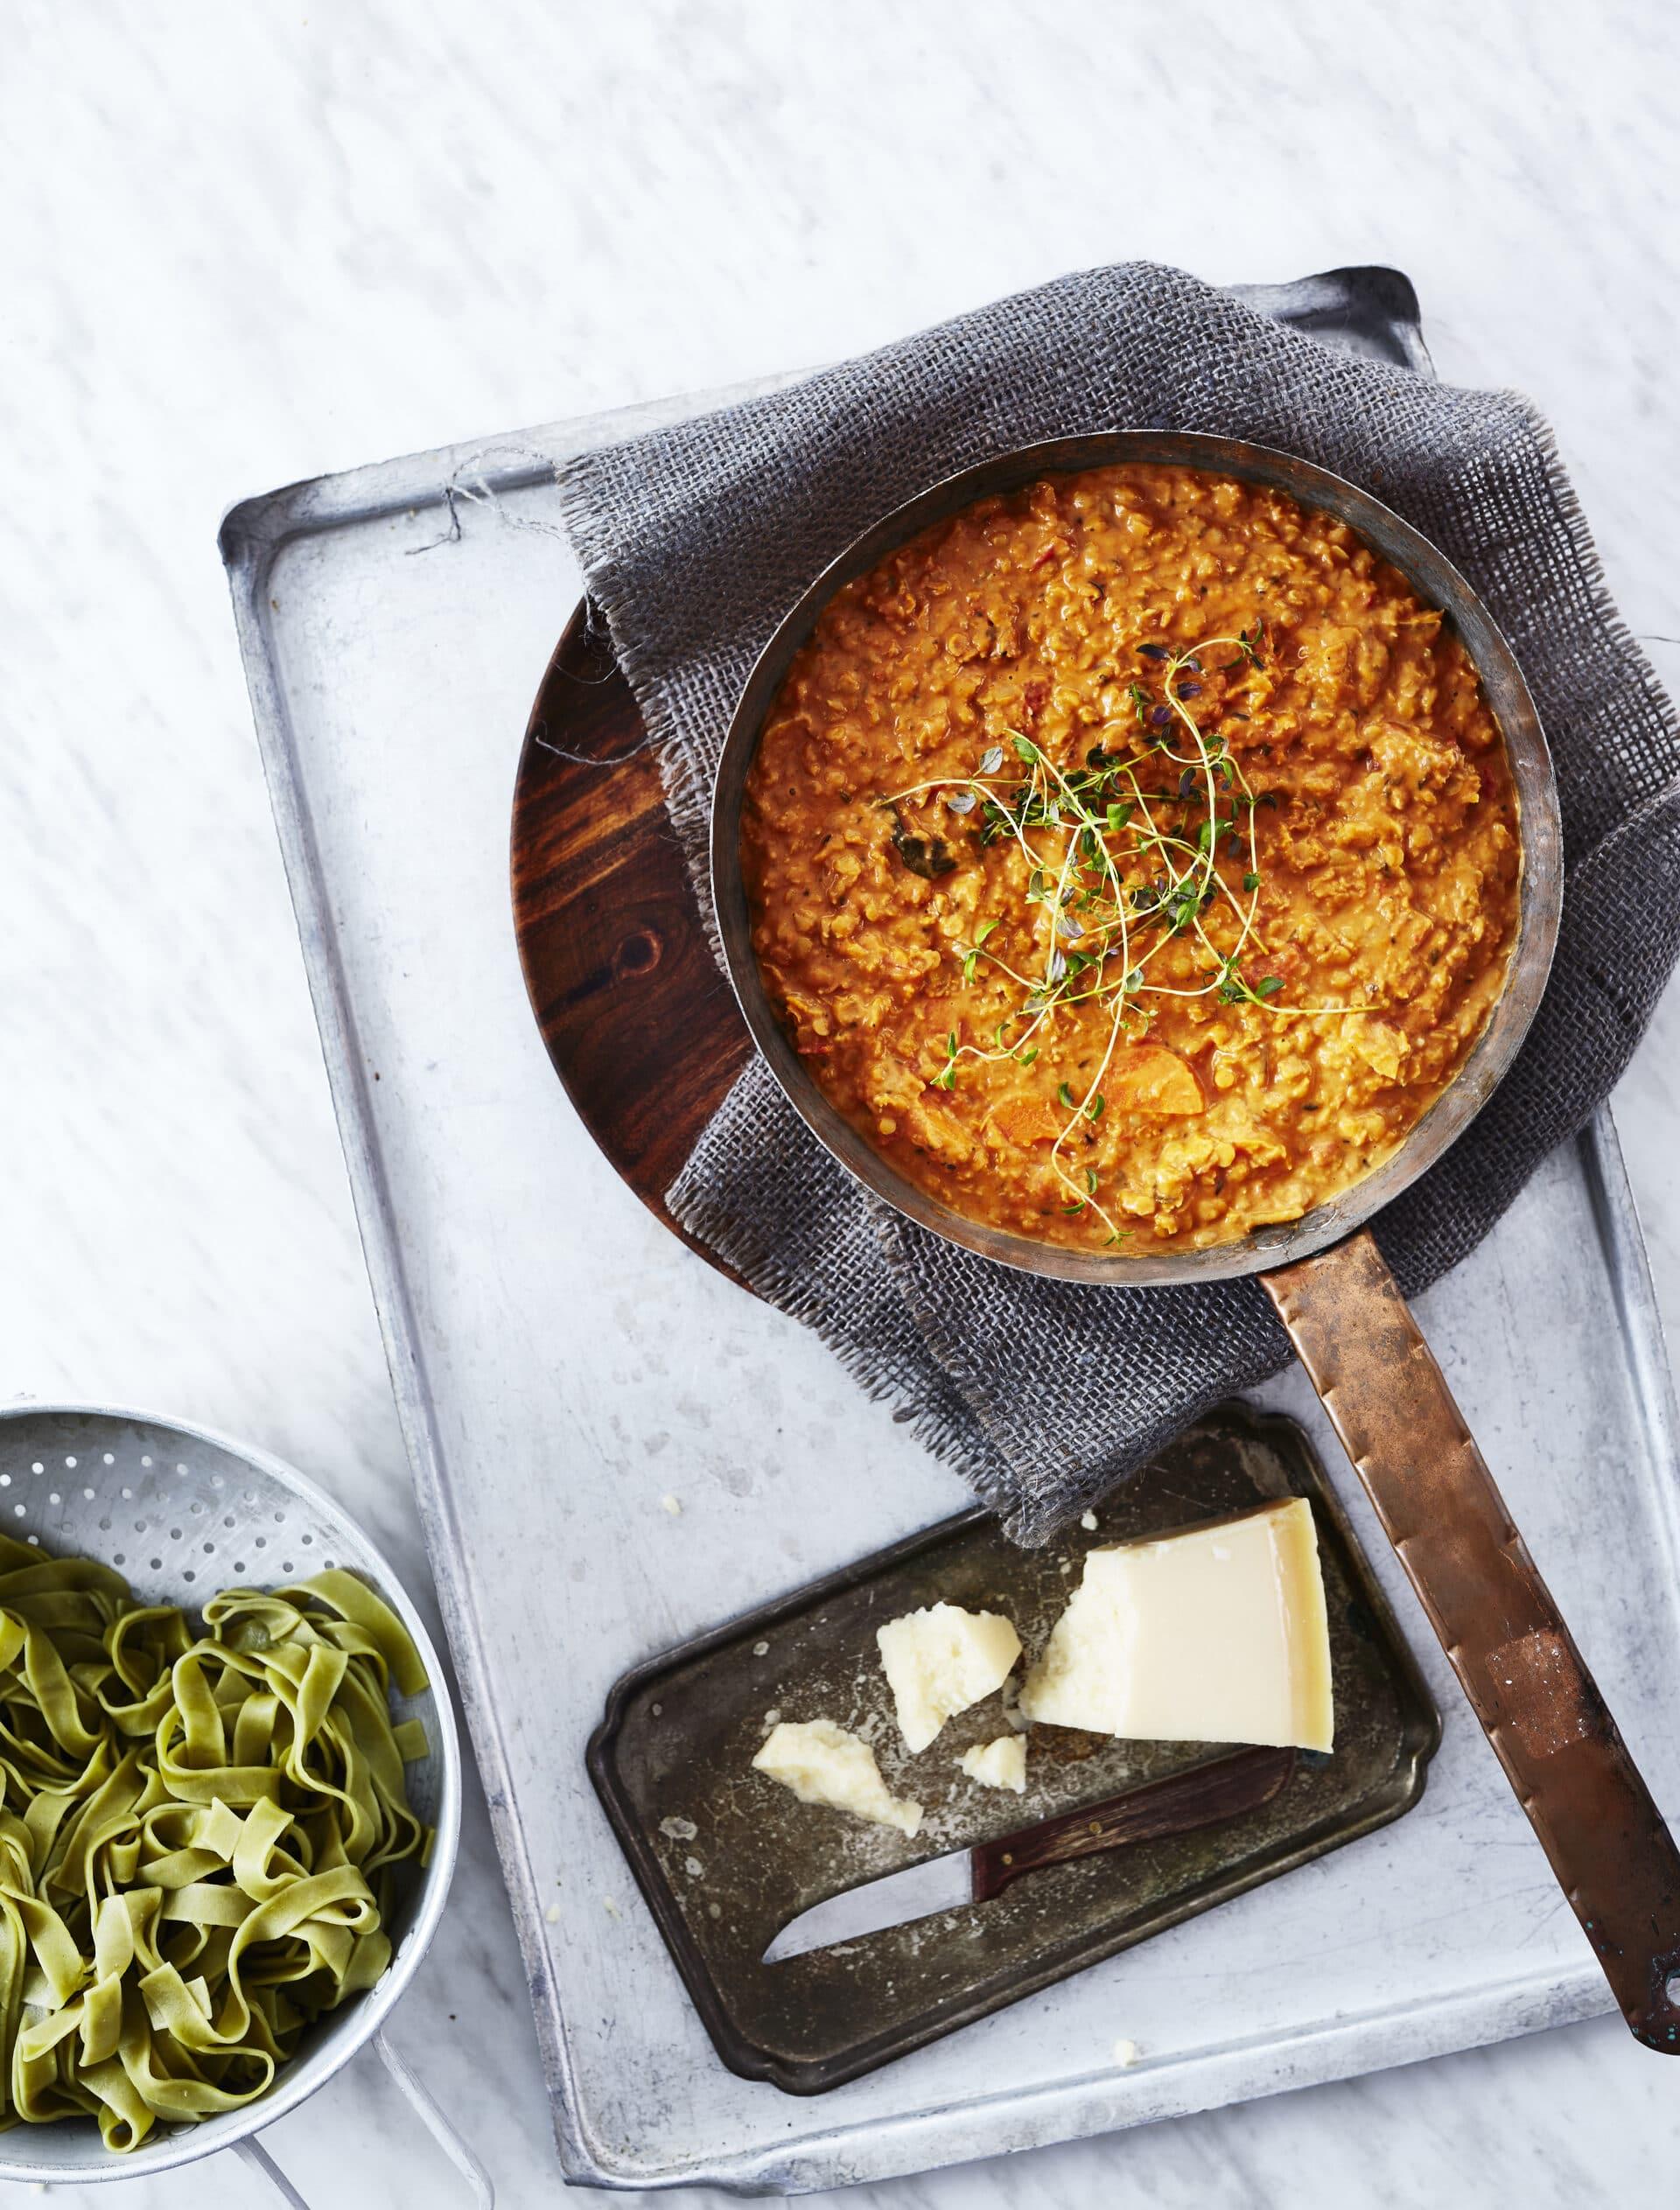 Opskrift fra kogebogen: Linsebolognese med fuldkornsspaghetti